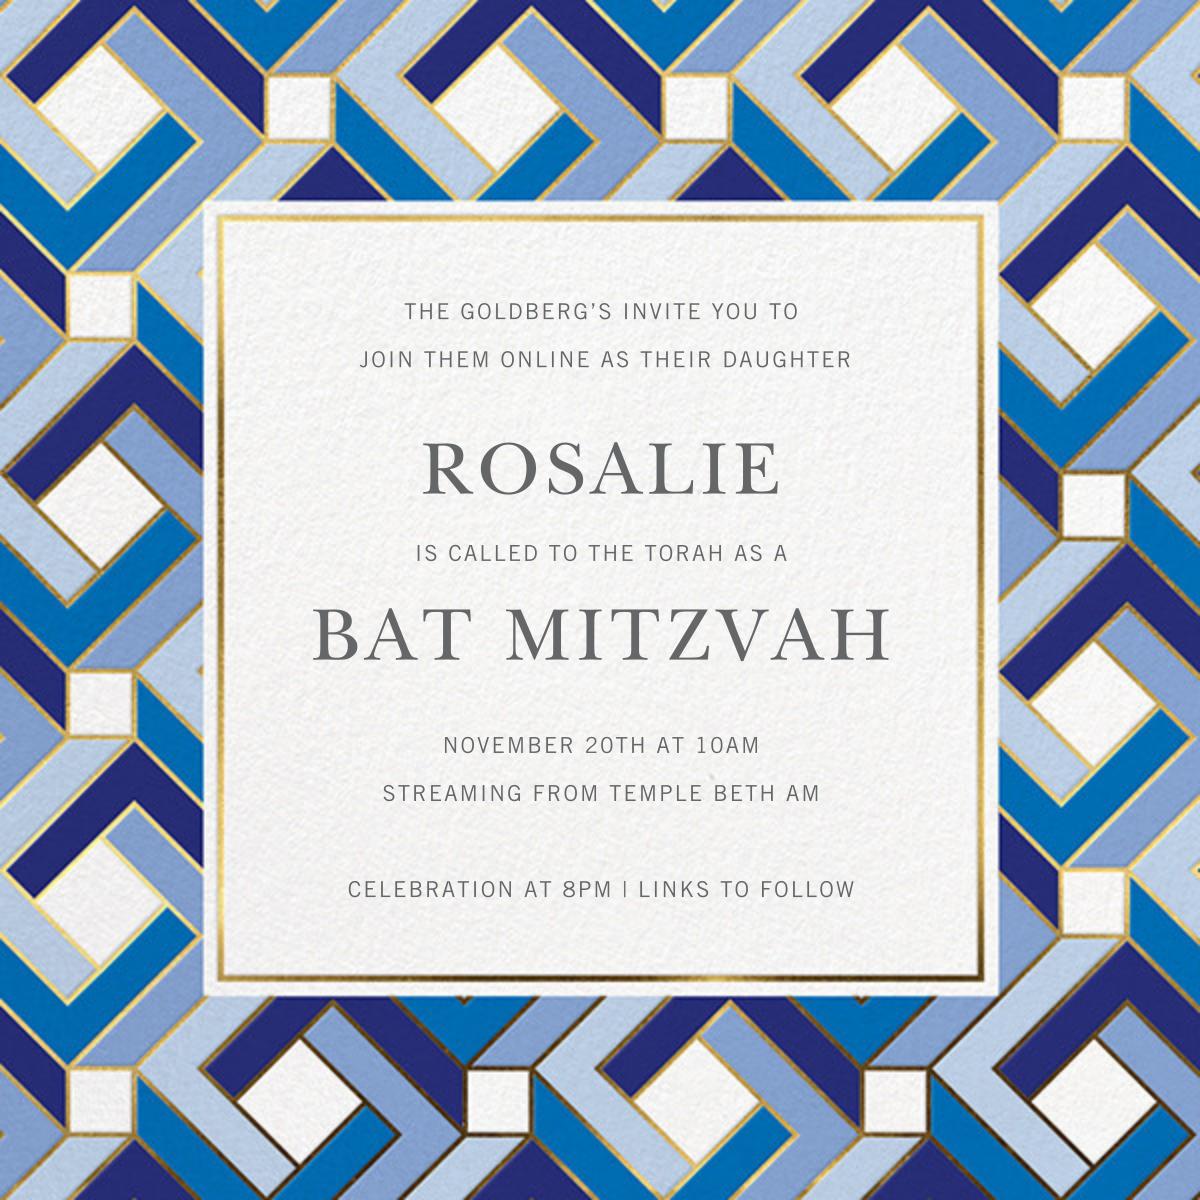 Penrose - Jonathan Adler - Bar and bat mitzvah